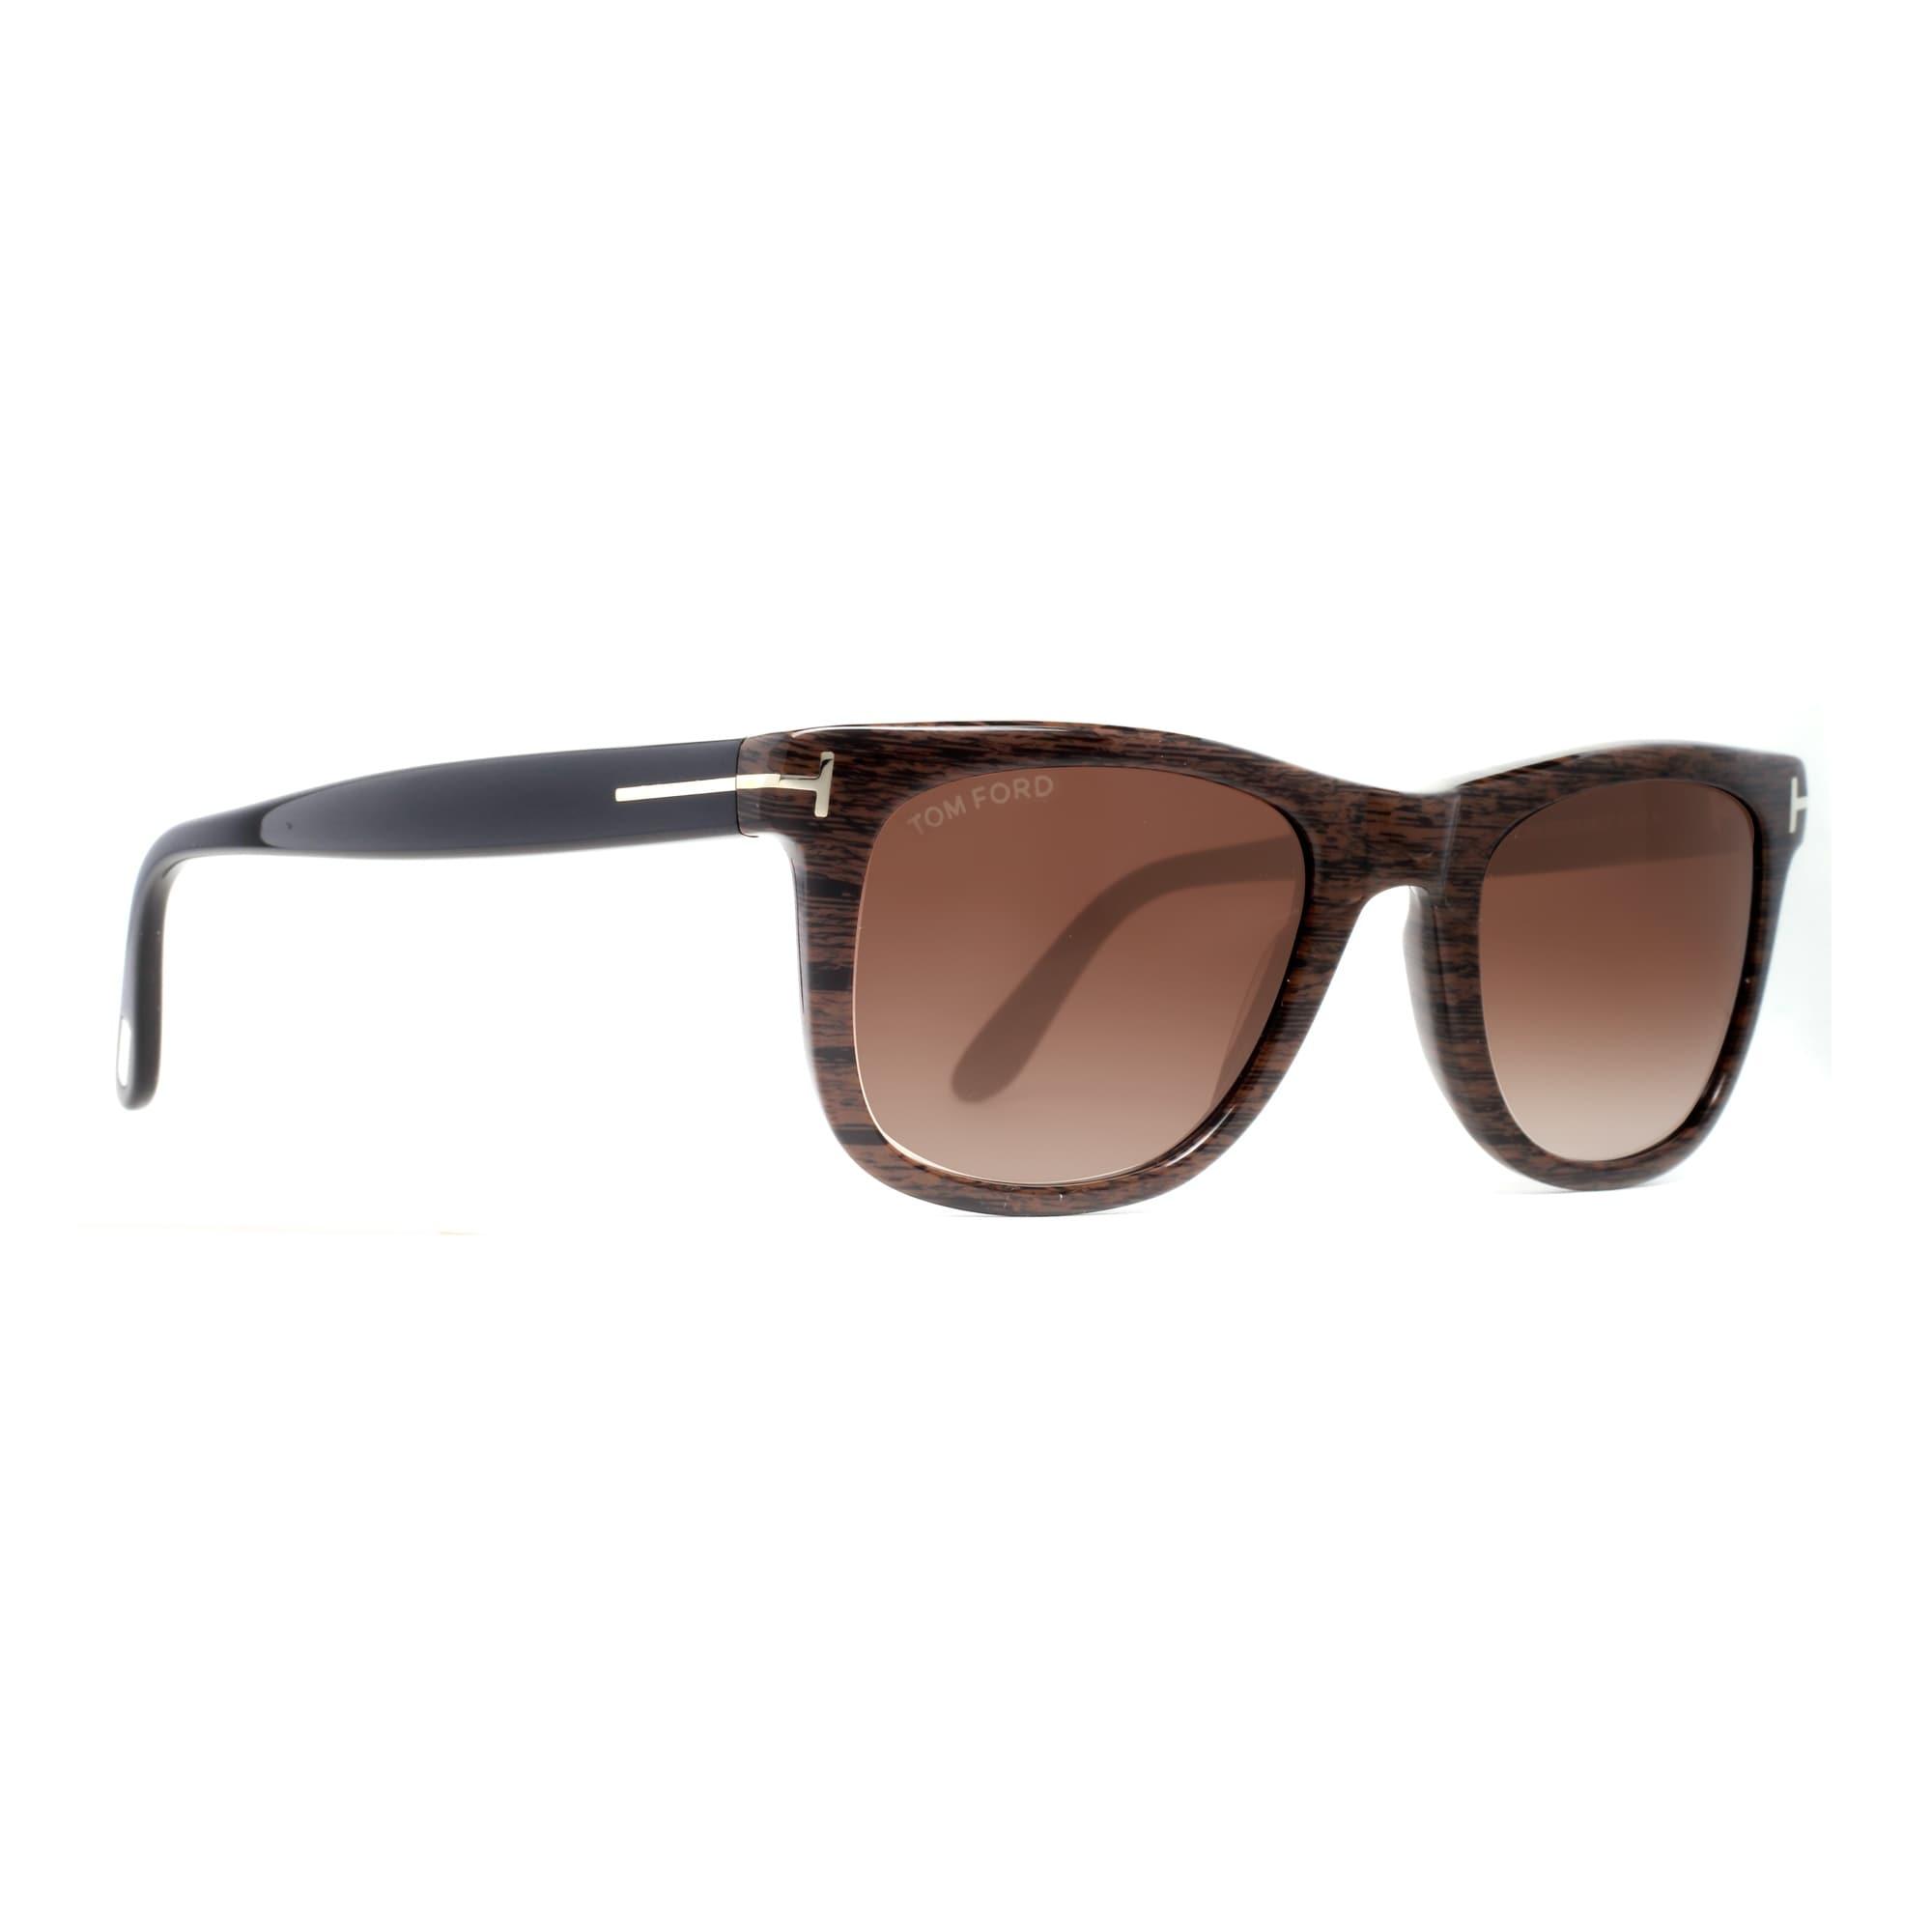 438aaf1bdc0 Shop Tom Ford Leo TF 336 05K Brown Wood Design Plastic Men s Black  Sunglasses - brown black with wood des - Free Shipping Today - Overstock -  14050958